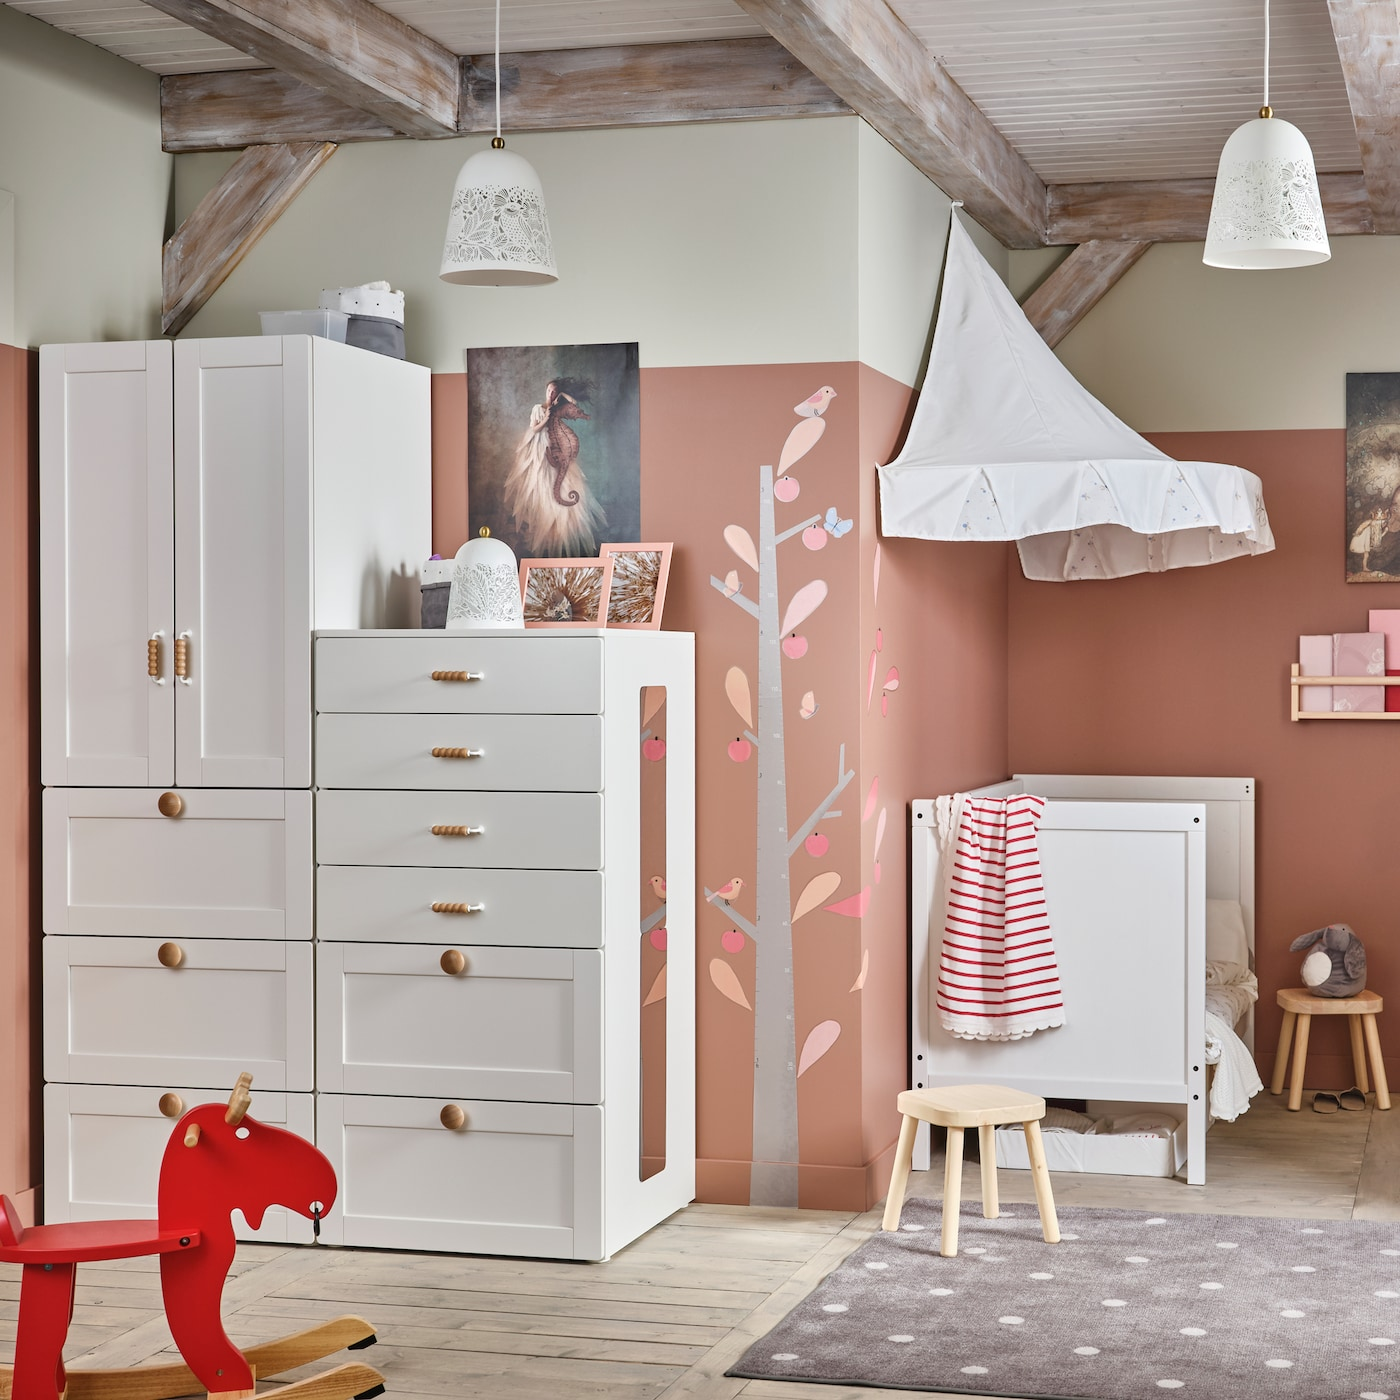 Inspiration Furs Kinderzimmer Ikea Ikea Osterreich